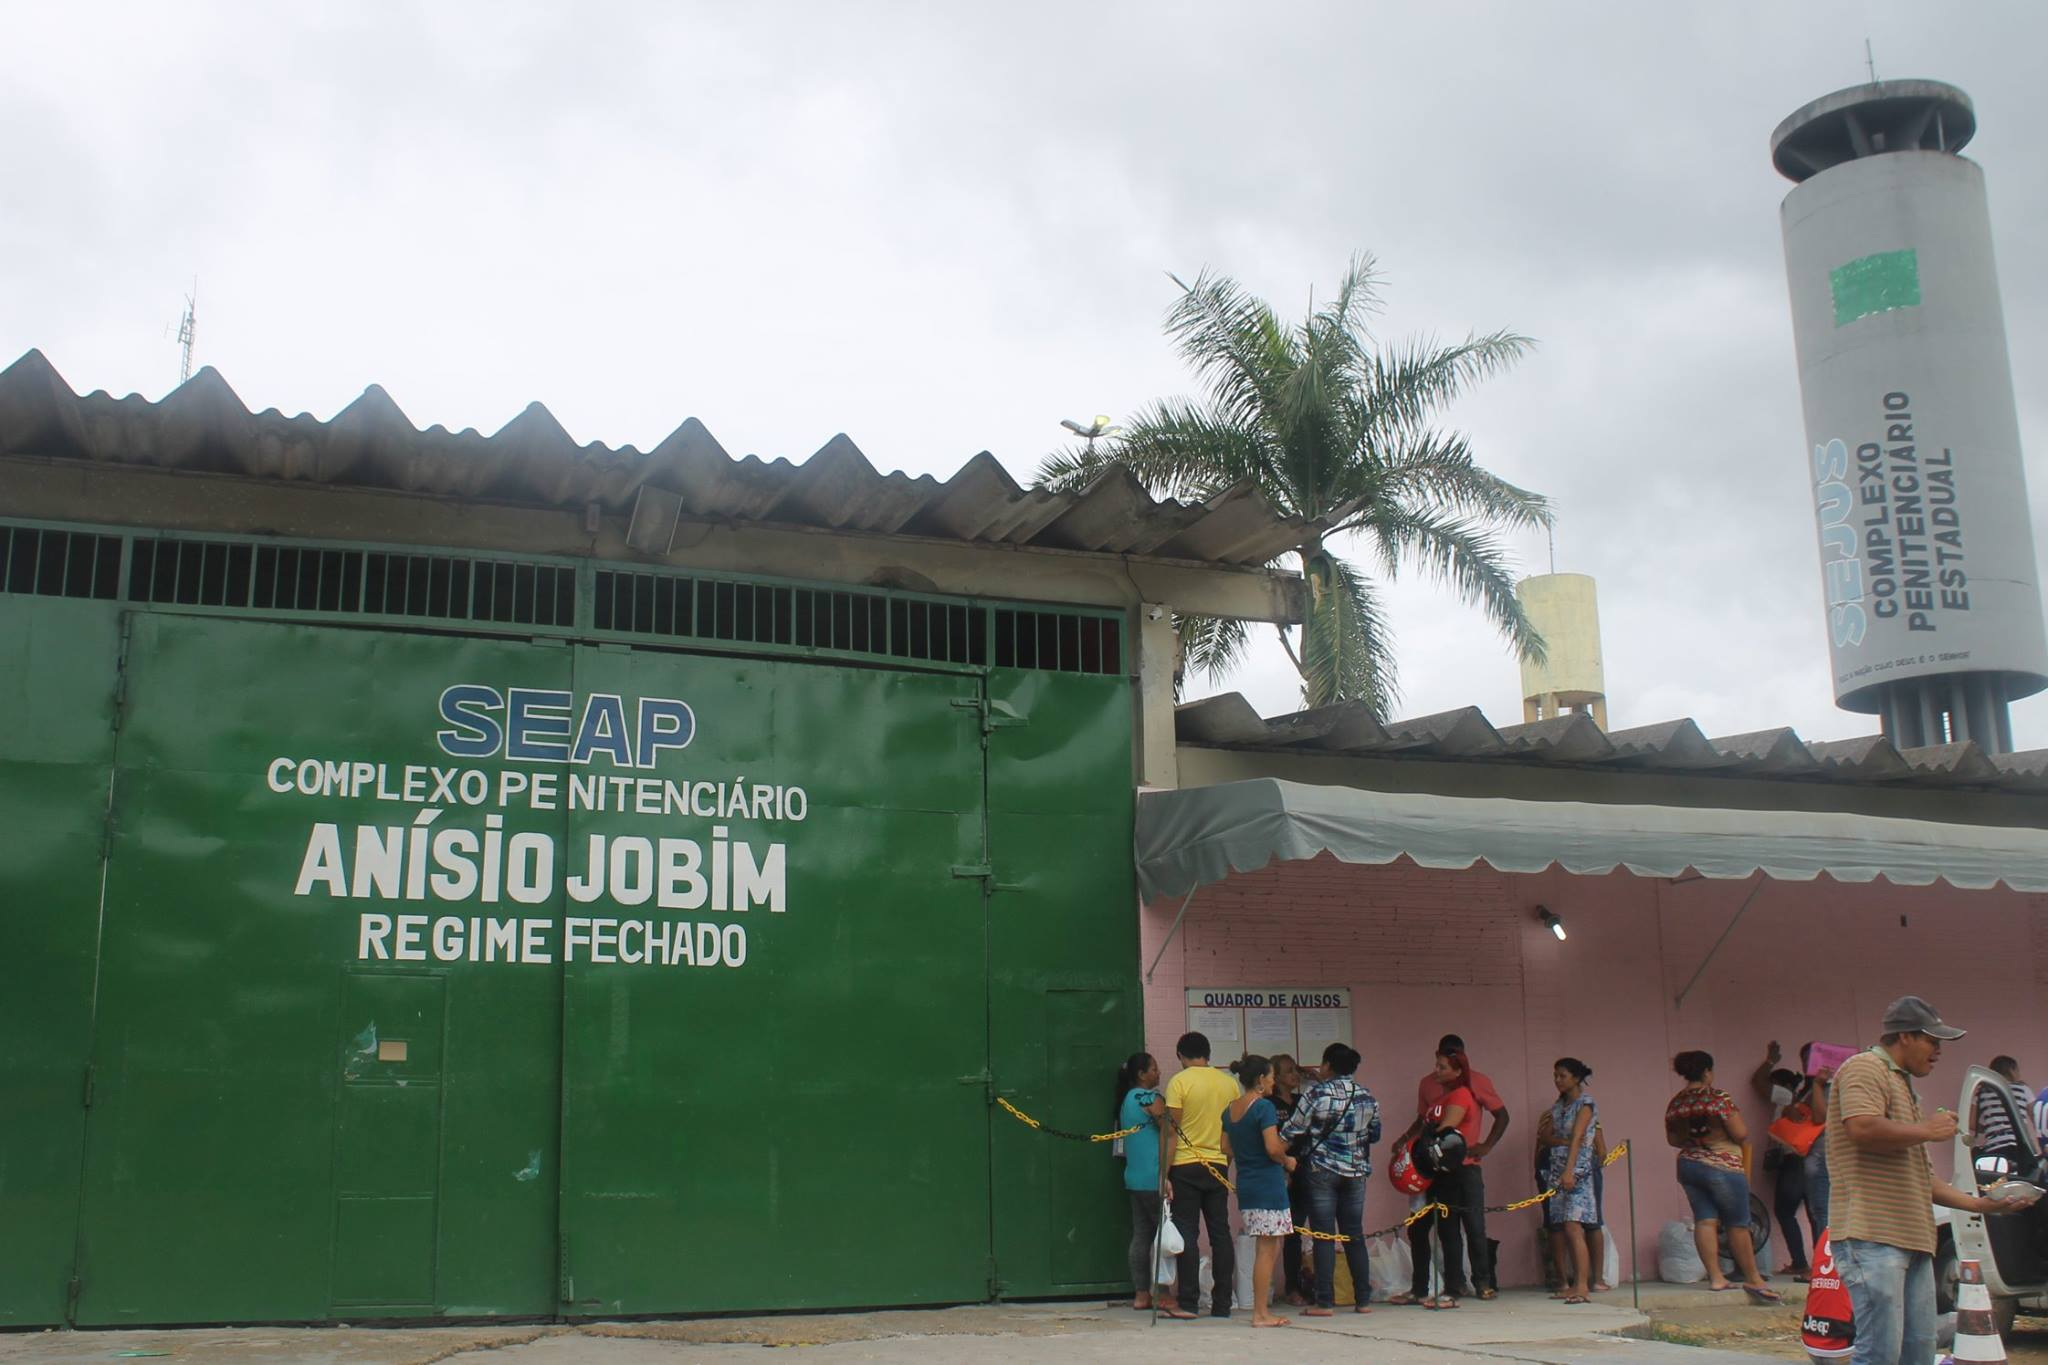 Segurança - presídio - Complexo Penitenciário Anísio Jobim Manaus Amazonas presos